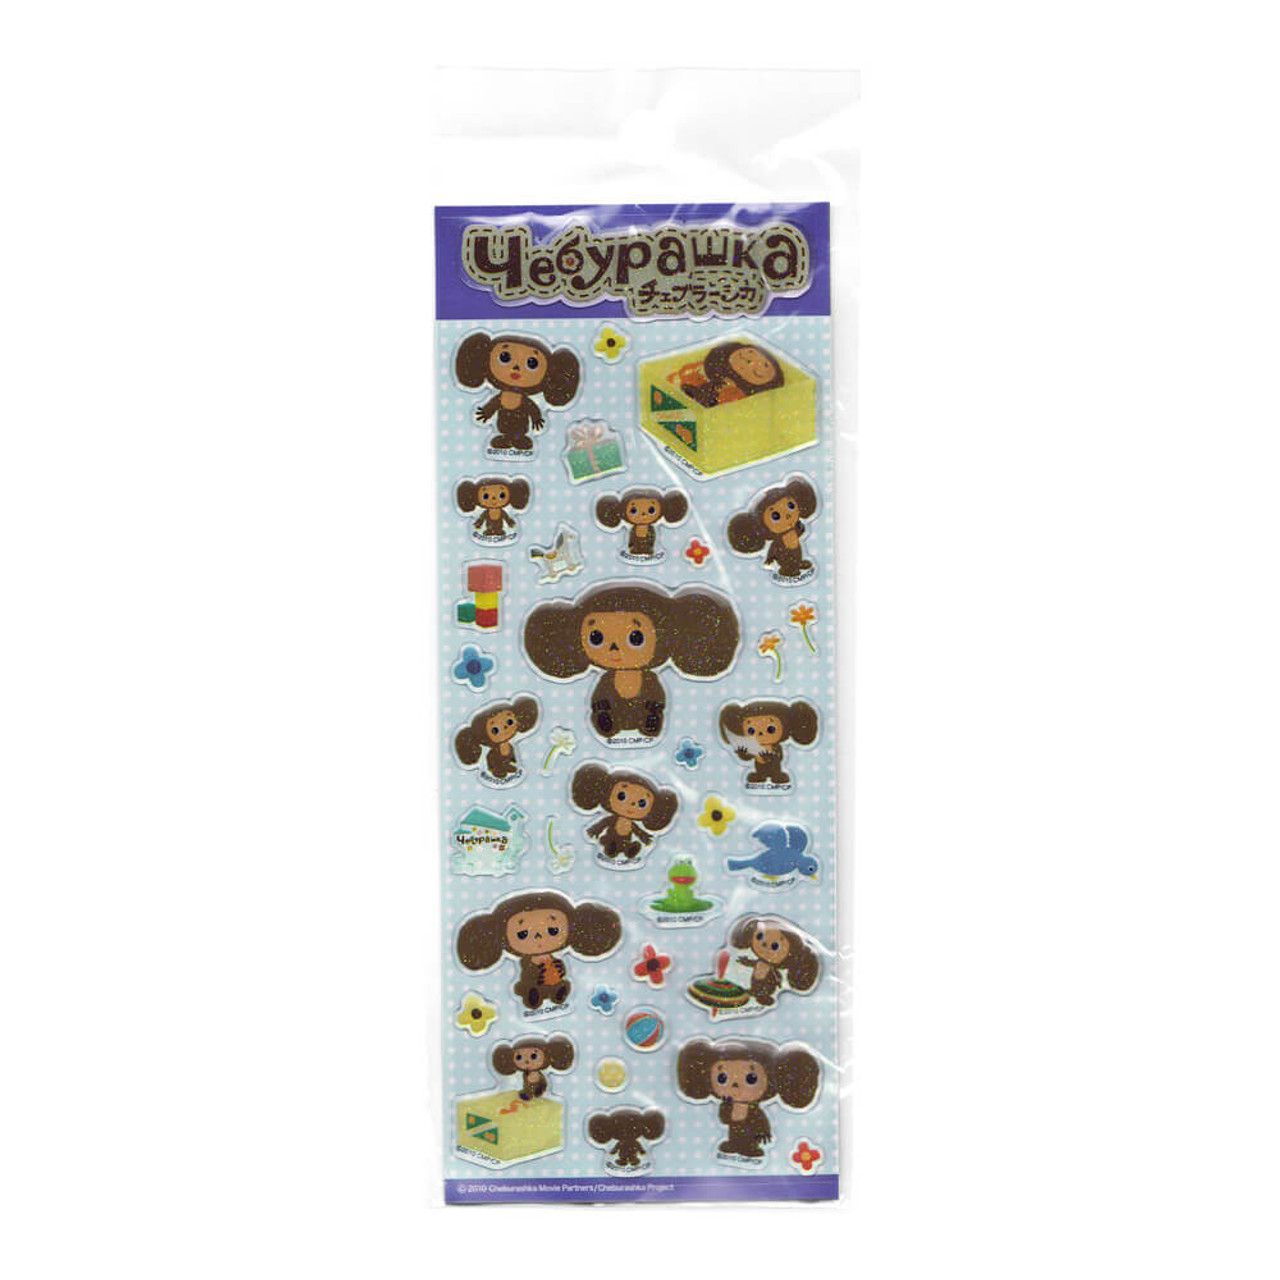 Cheburashka Yeoypawka 3D Puffy Sticker CHST04 - Daily ( Full Sticker View )